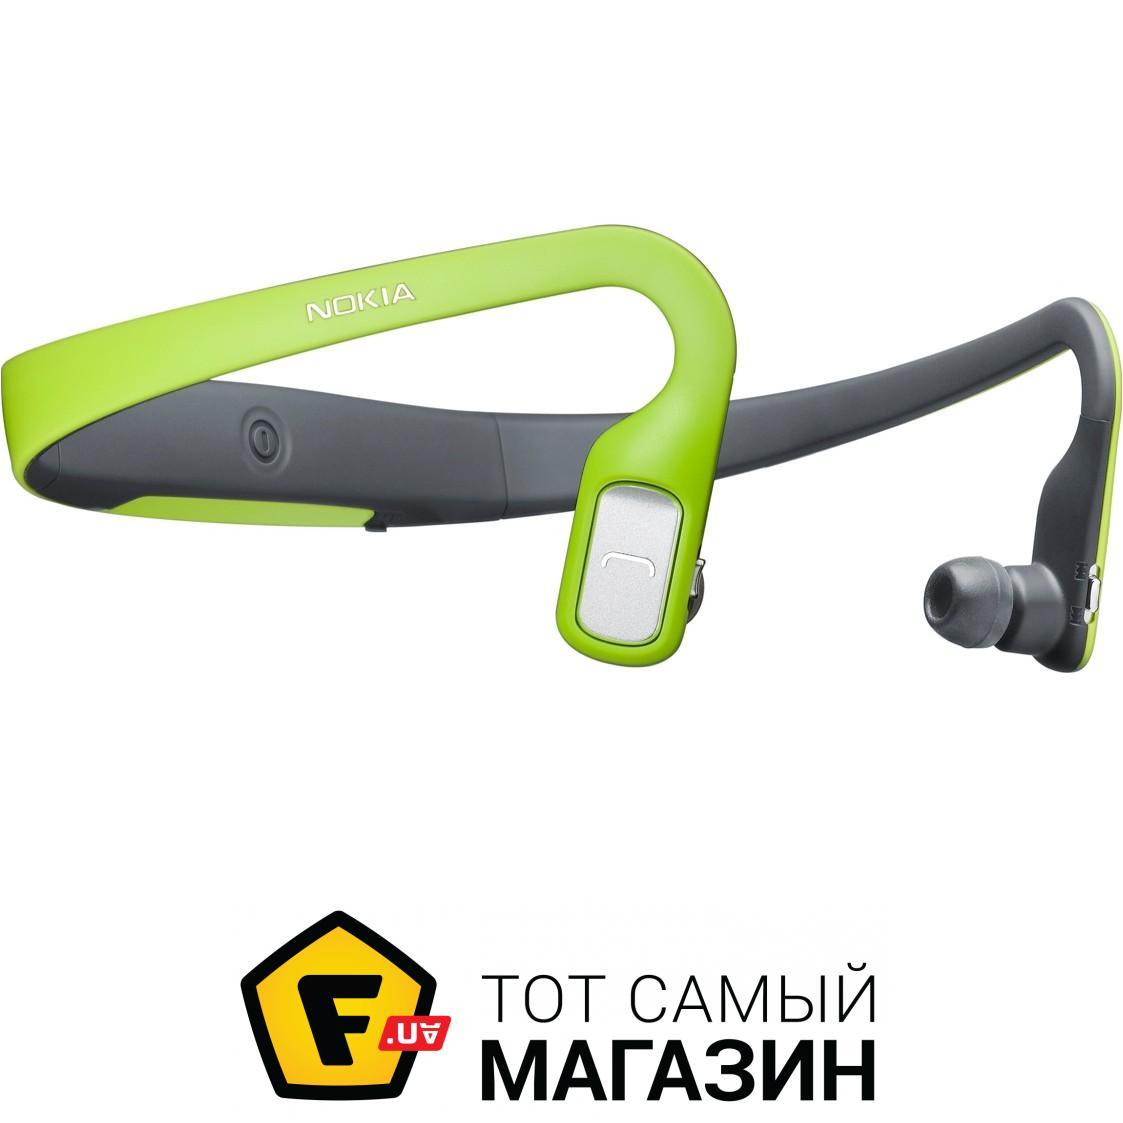 ᐈ Nokia BH-505 Green ~ Надо Купить? 《ЦЕНА Снижена》 • 퐅.퐔퐀